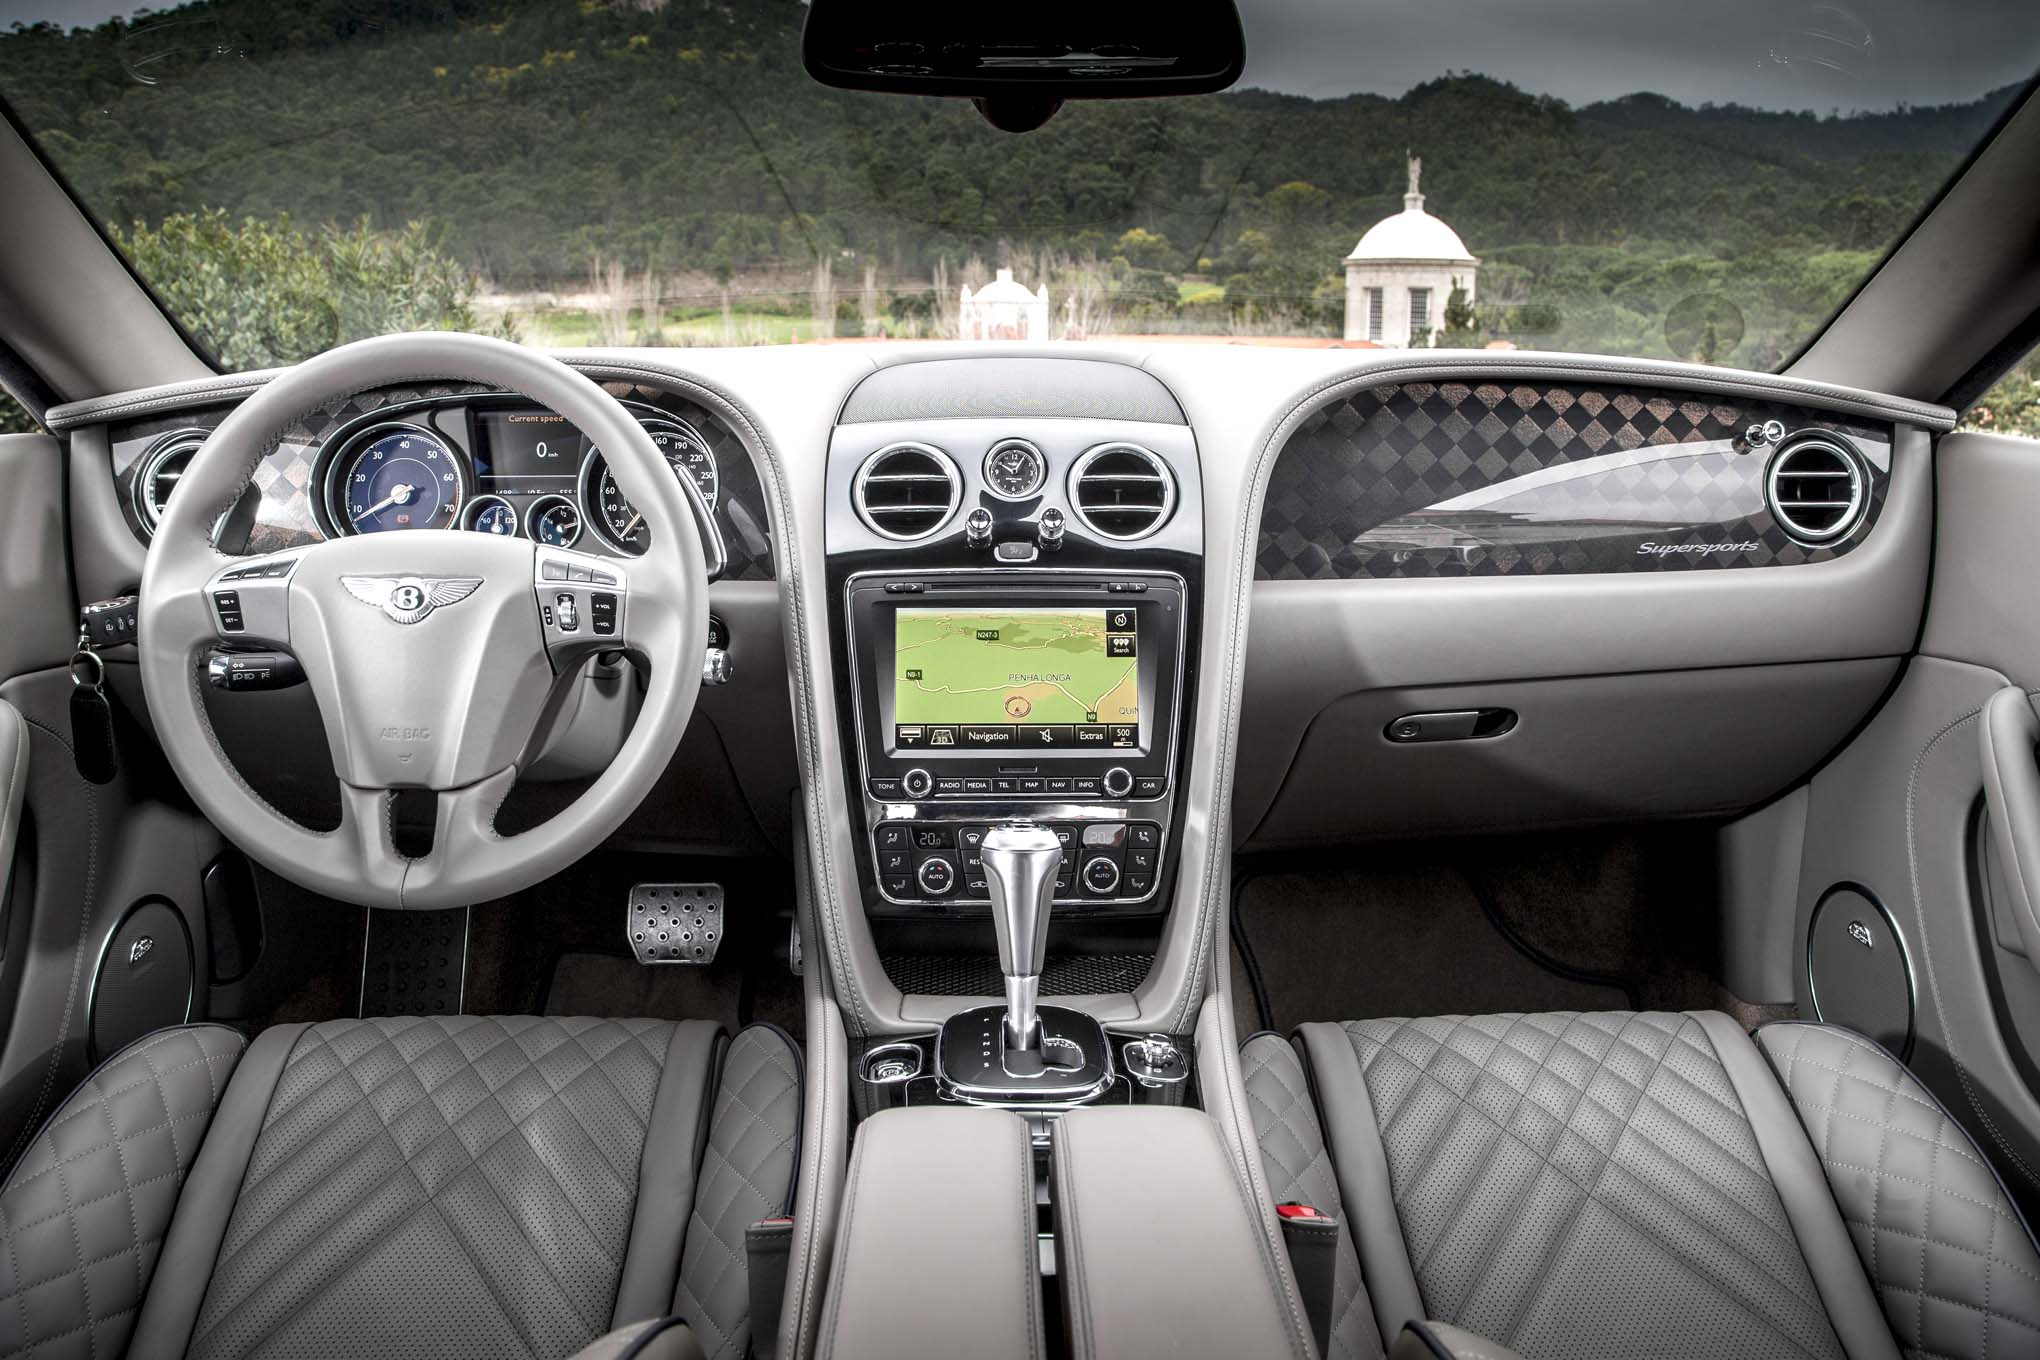 2018 bentley truck interior. brilliant truck show more for 2018 bentley truck interior